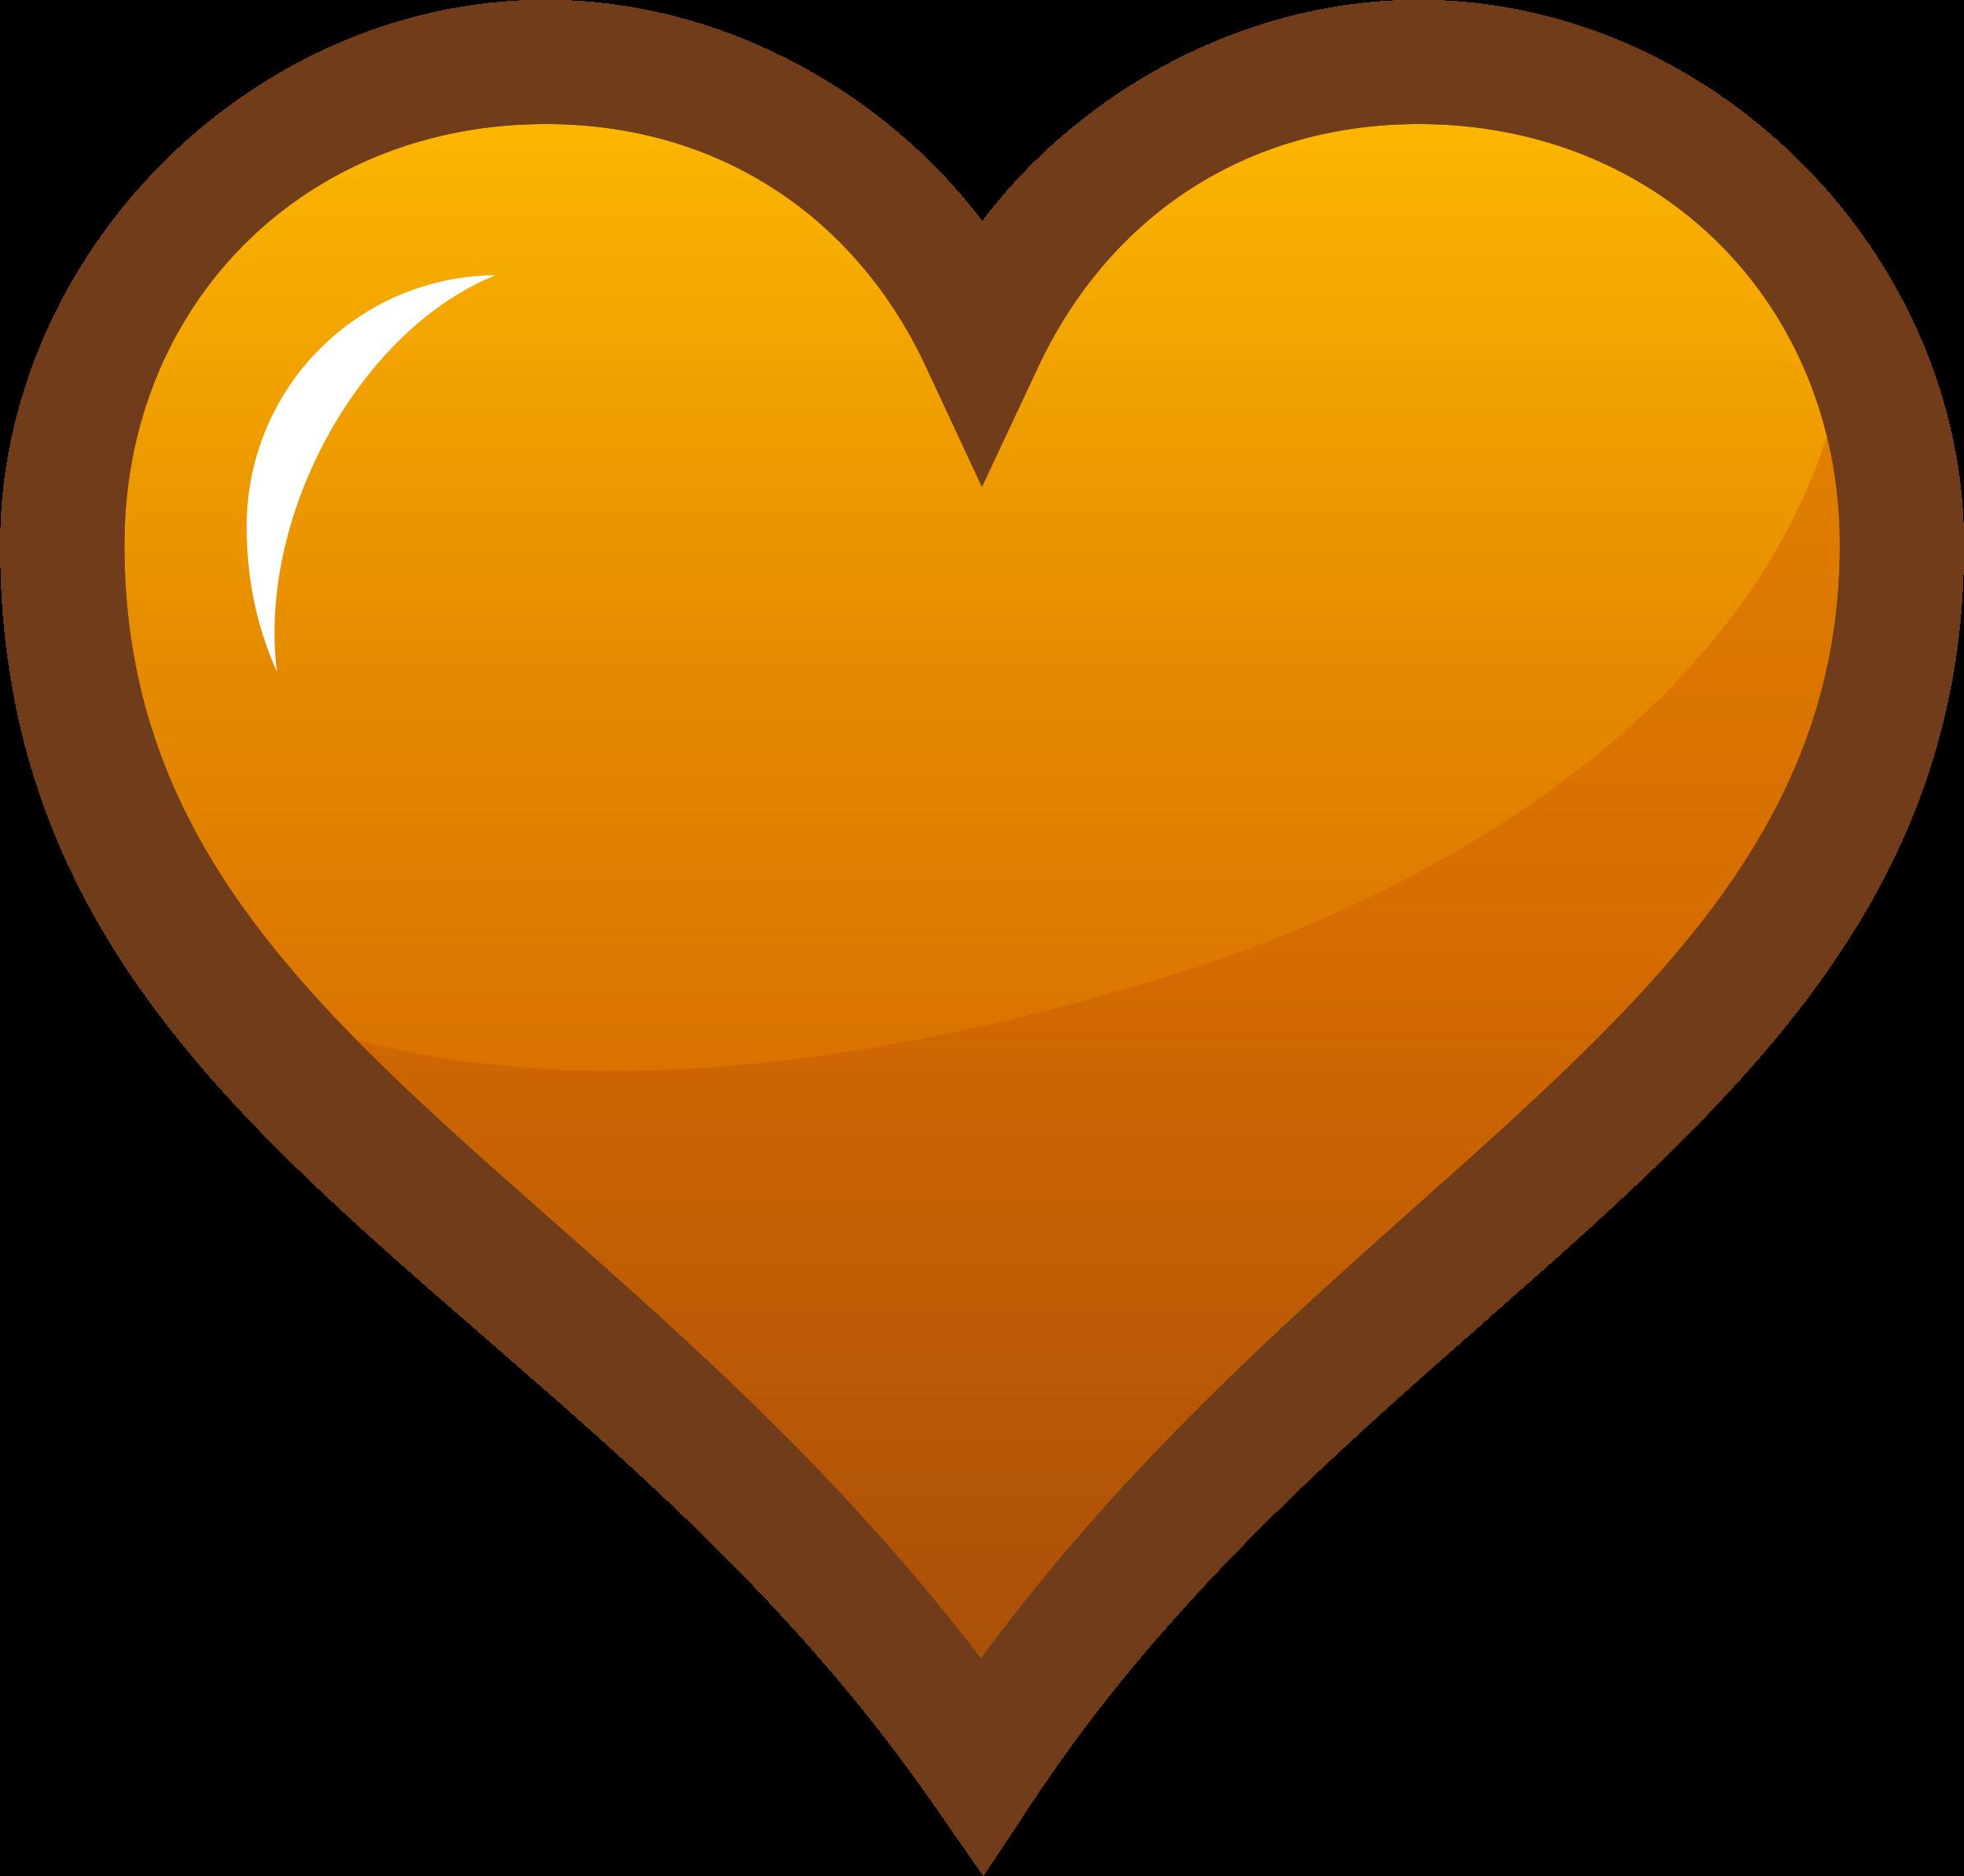 Hearts icon frames illustrations. Hook clipart heart